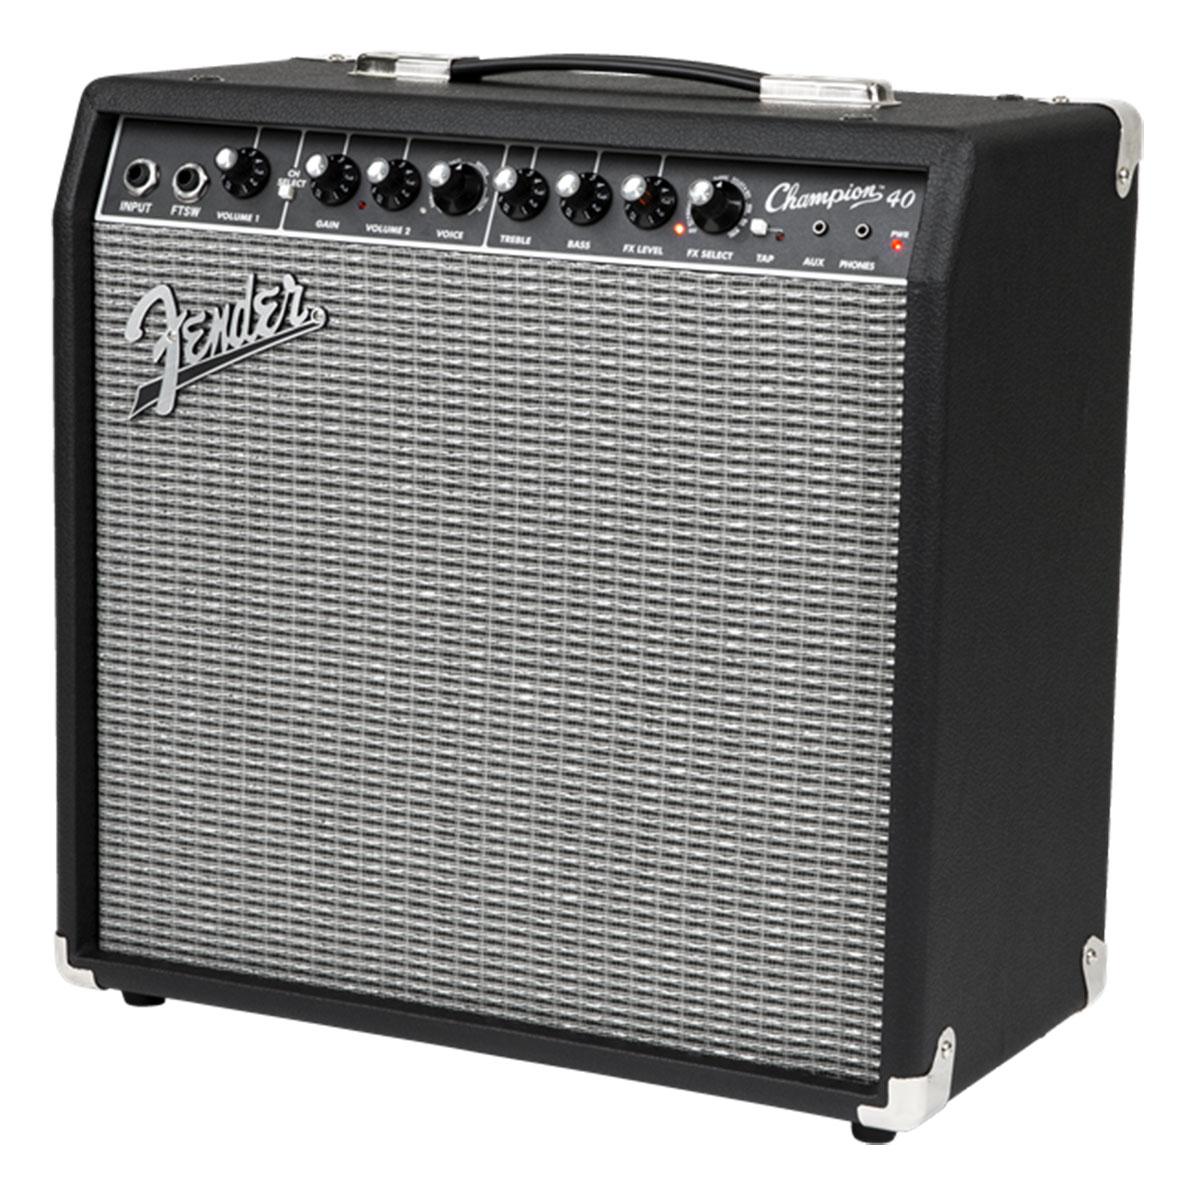 Fender - Champion 40